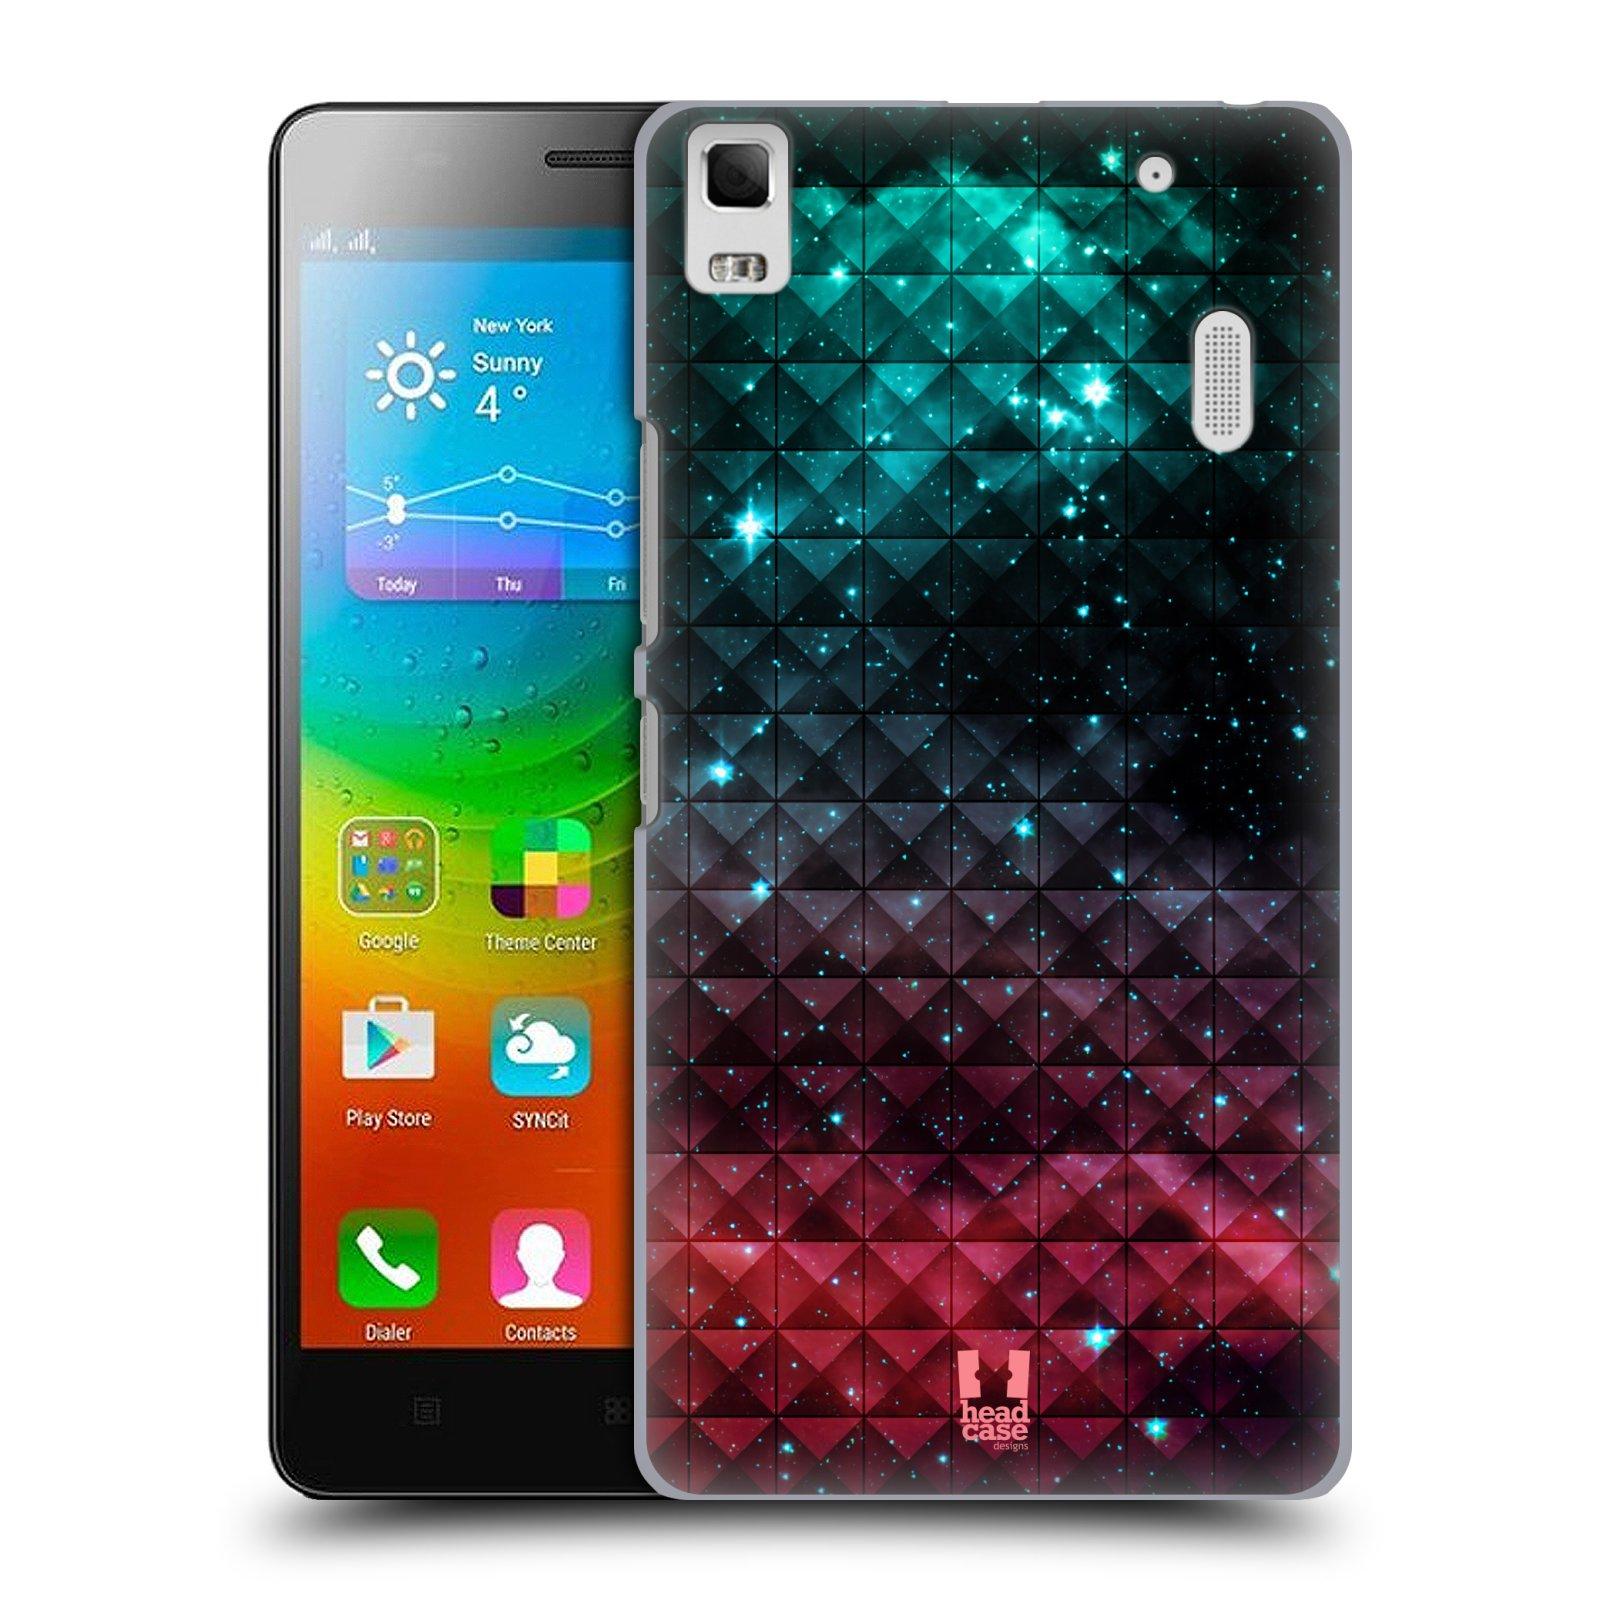 HEAD CASE pevný plastový obal na mobil LENOVO A7000 / A7000 DUAL / K3 NOTE vzor Hvězdná obloha hvězdy a slunce RUDÁ A MODRÁ